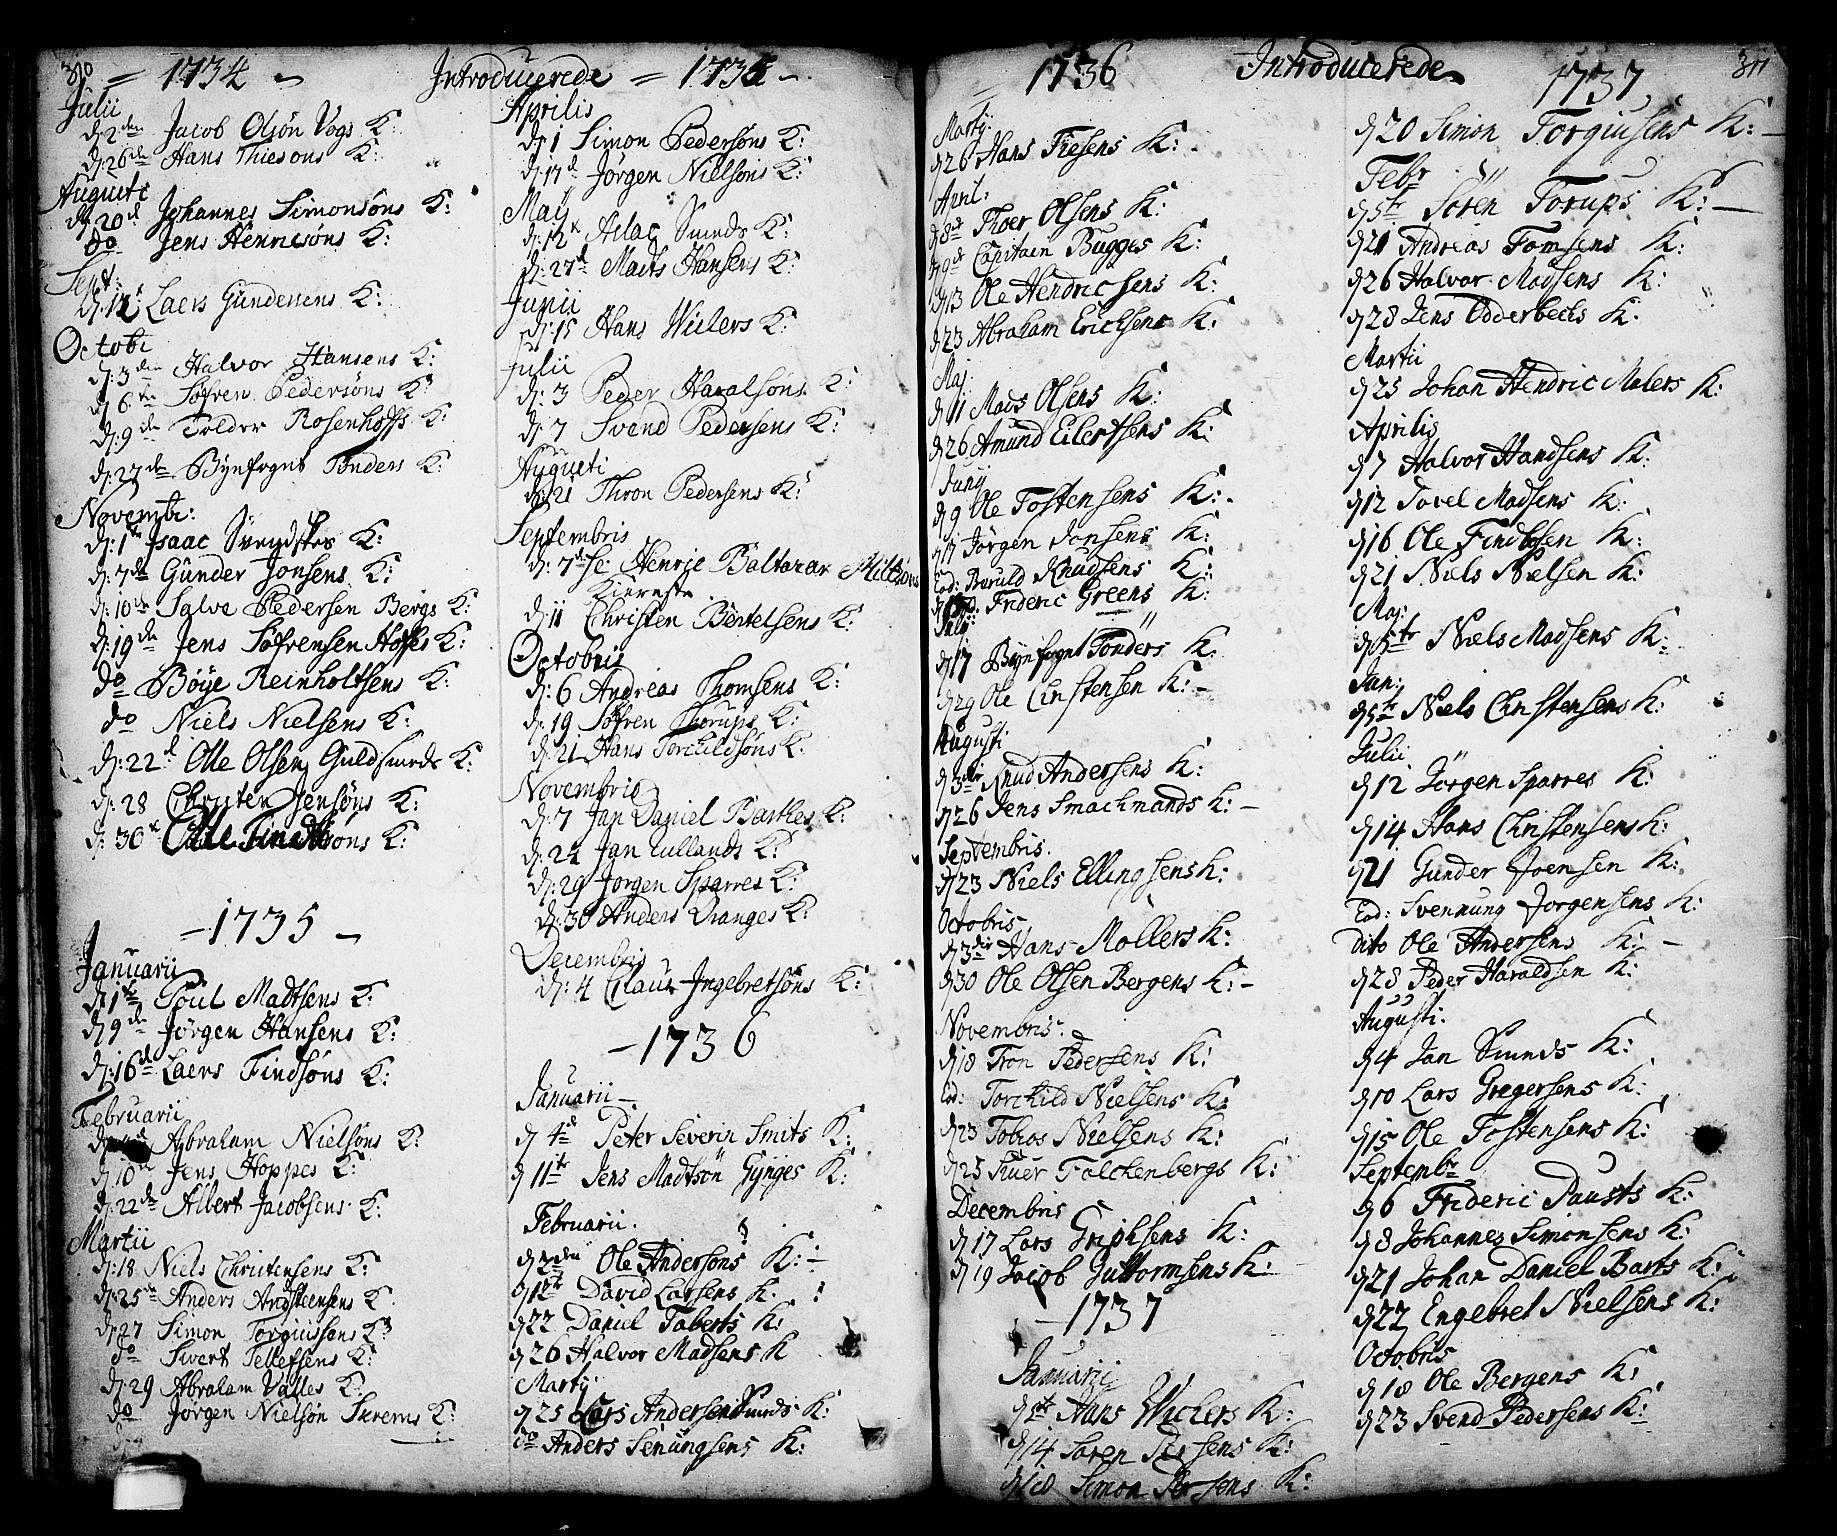 SAKO, Kragerø kirkebøker, F/Fa/L0001: Ministerialbok nr. 1, 1702-1766, s. 310-311